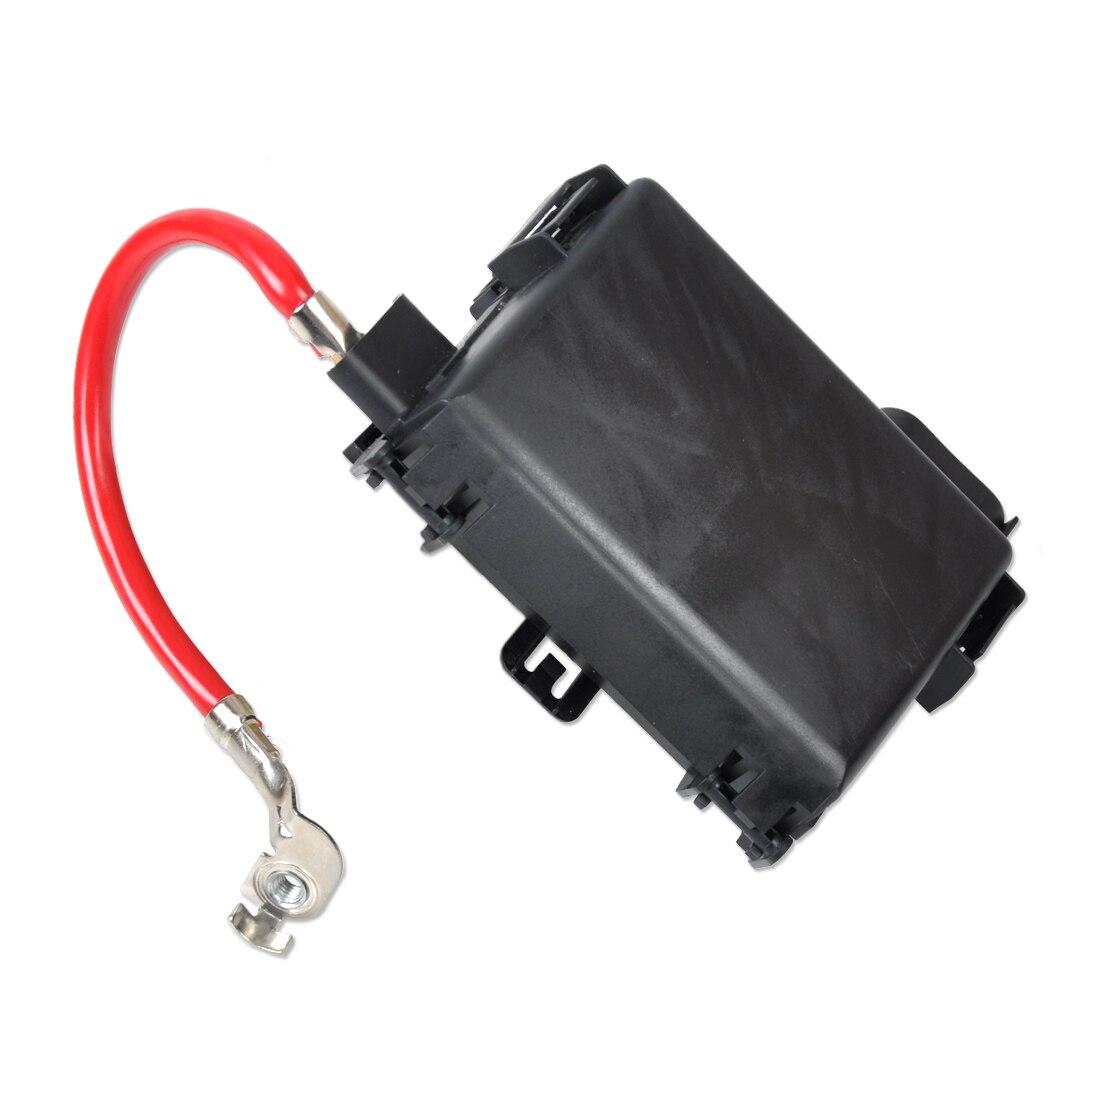 Dwcx 1j0937550a Black Fuse Box Battery Terminal For Volkswagen Vw Audi S6 New 1j0 937 550a Beetle Golf Jetta